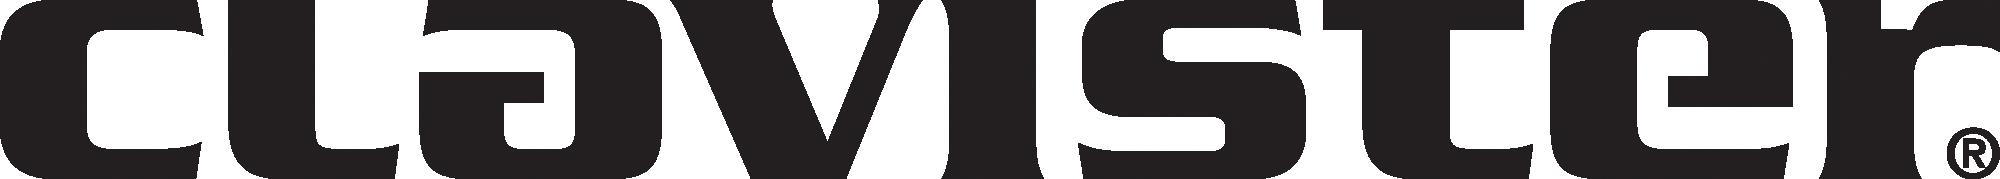 Clavister logo black